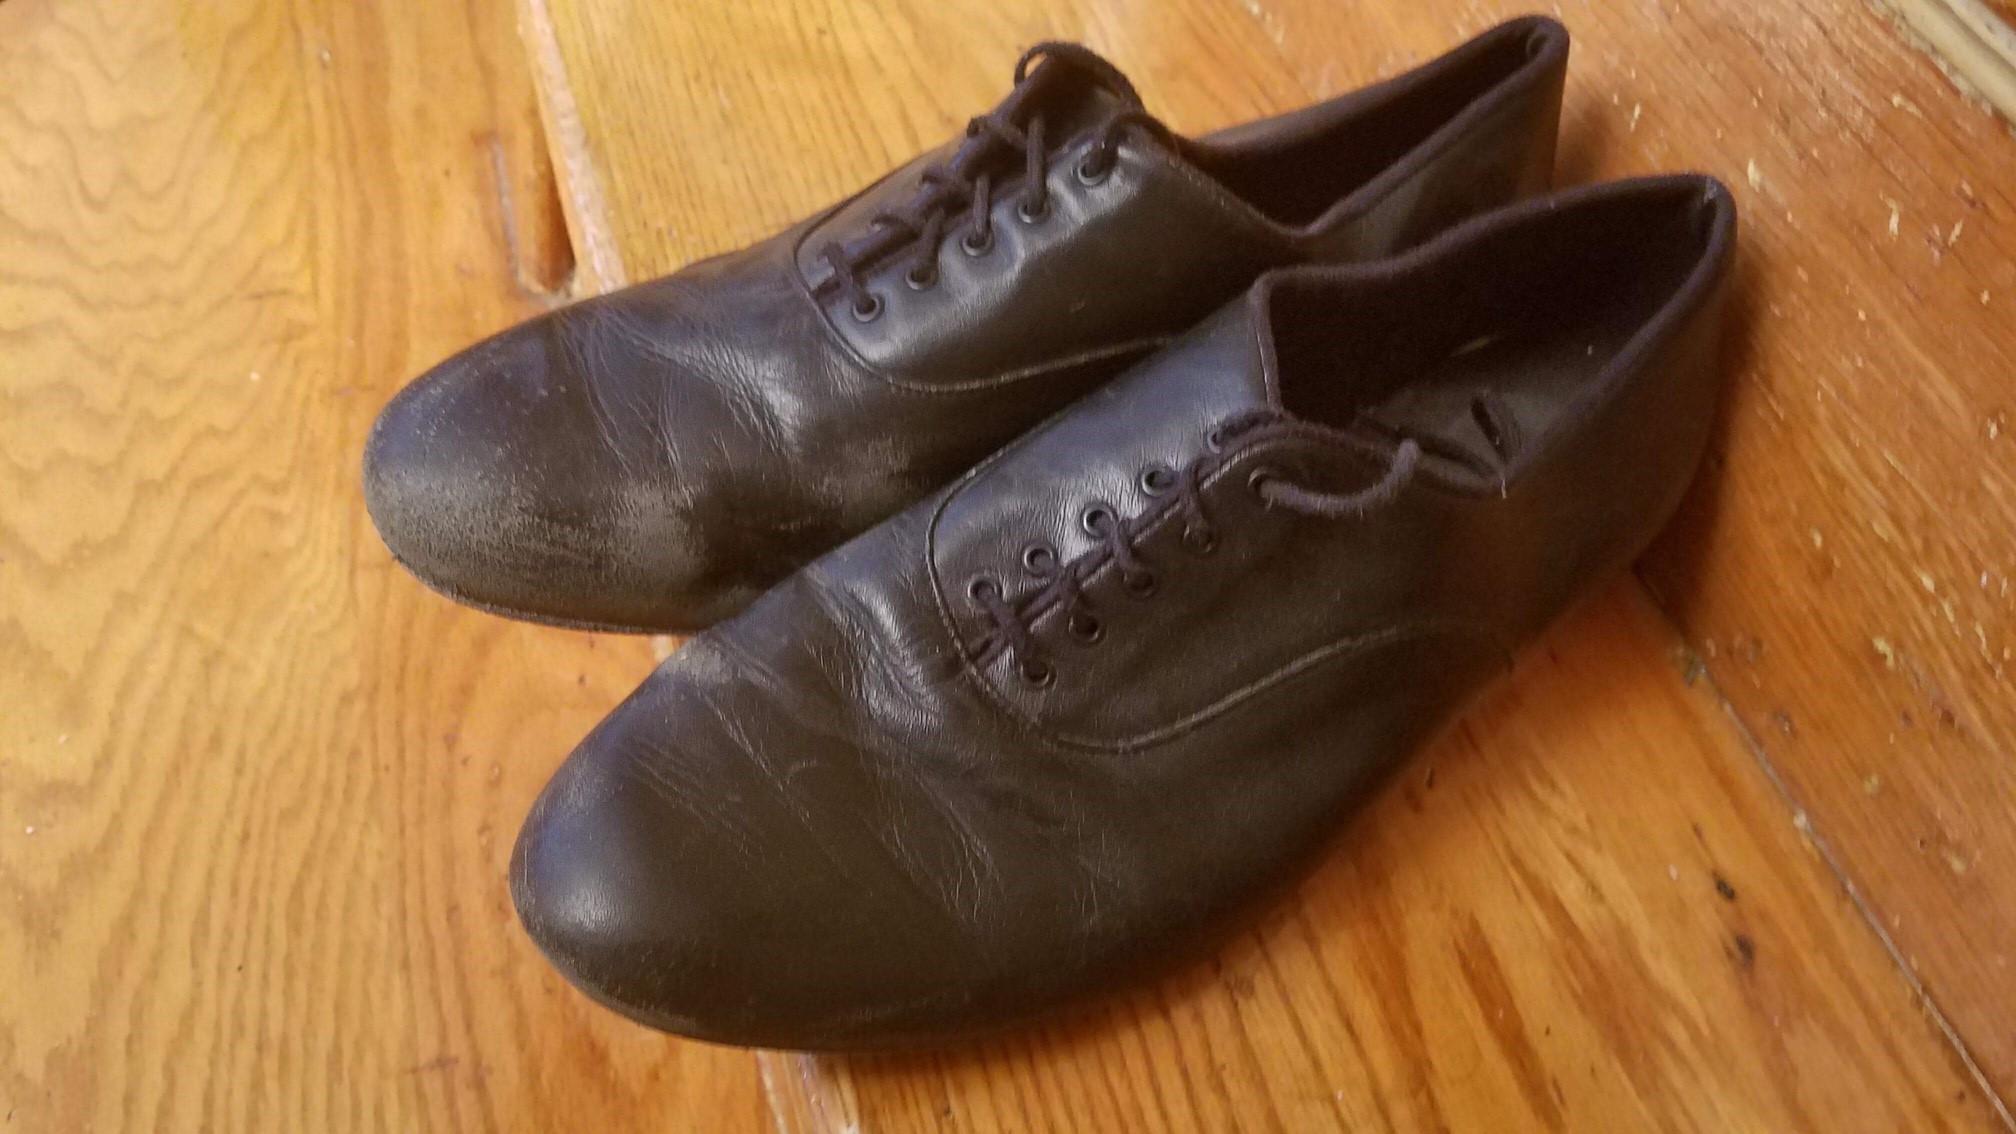 Performance Dancerwear, Black Leather, US Size 13 / Euro 47, Used, $25